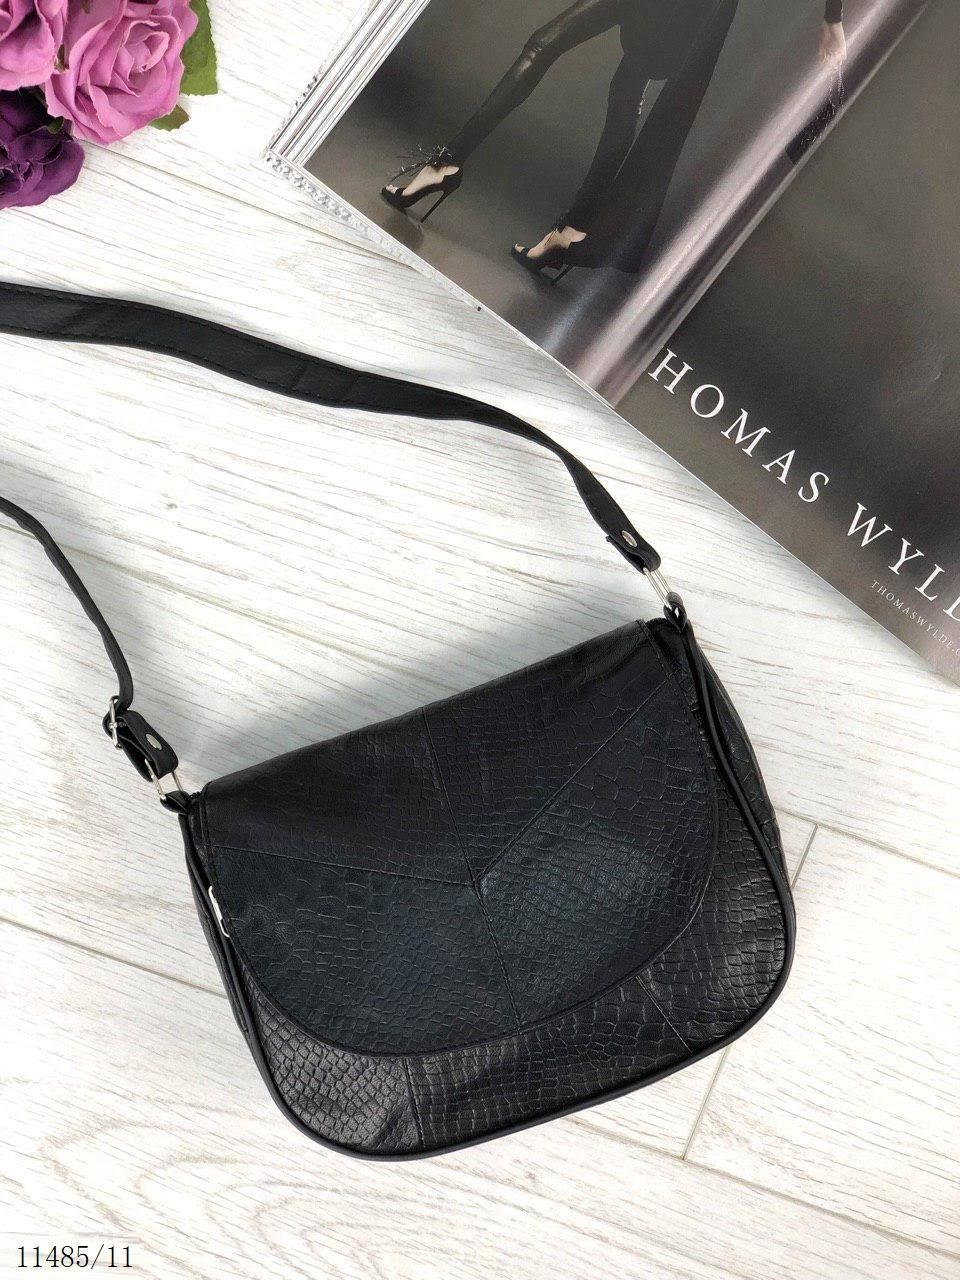 cb217b0d6a2c Маленькая сумочка женская кожаная сумка через плечо натуральная кожа черная  рептилия 11485/11 - Интернет